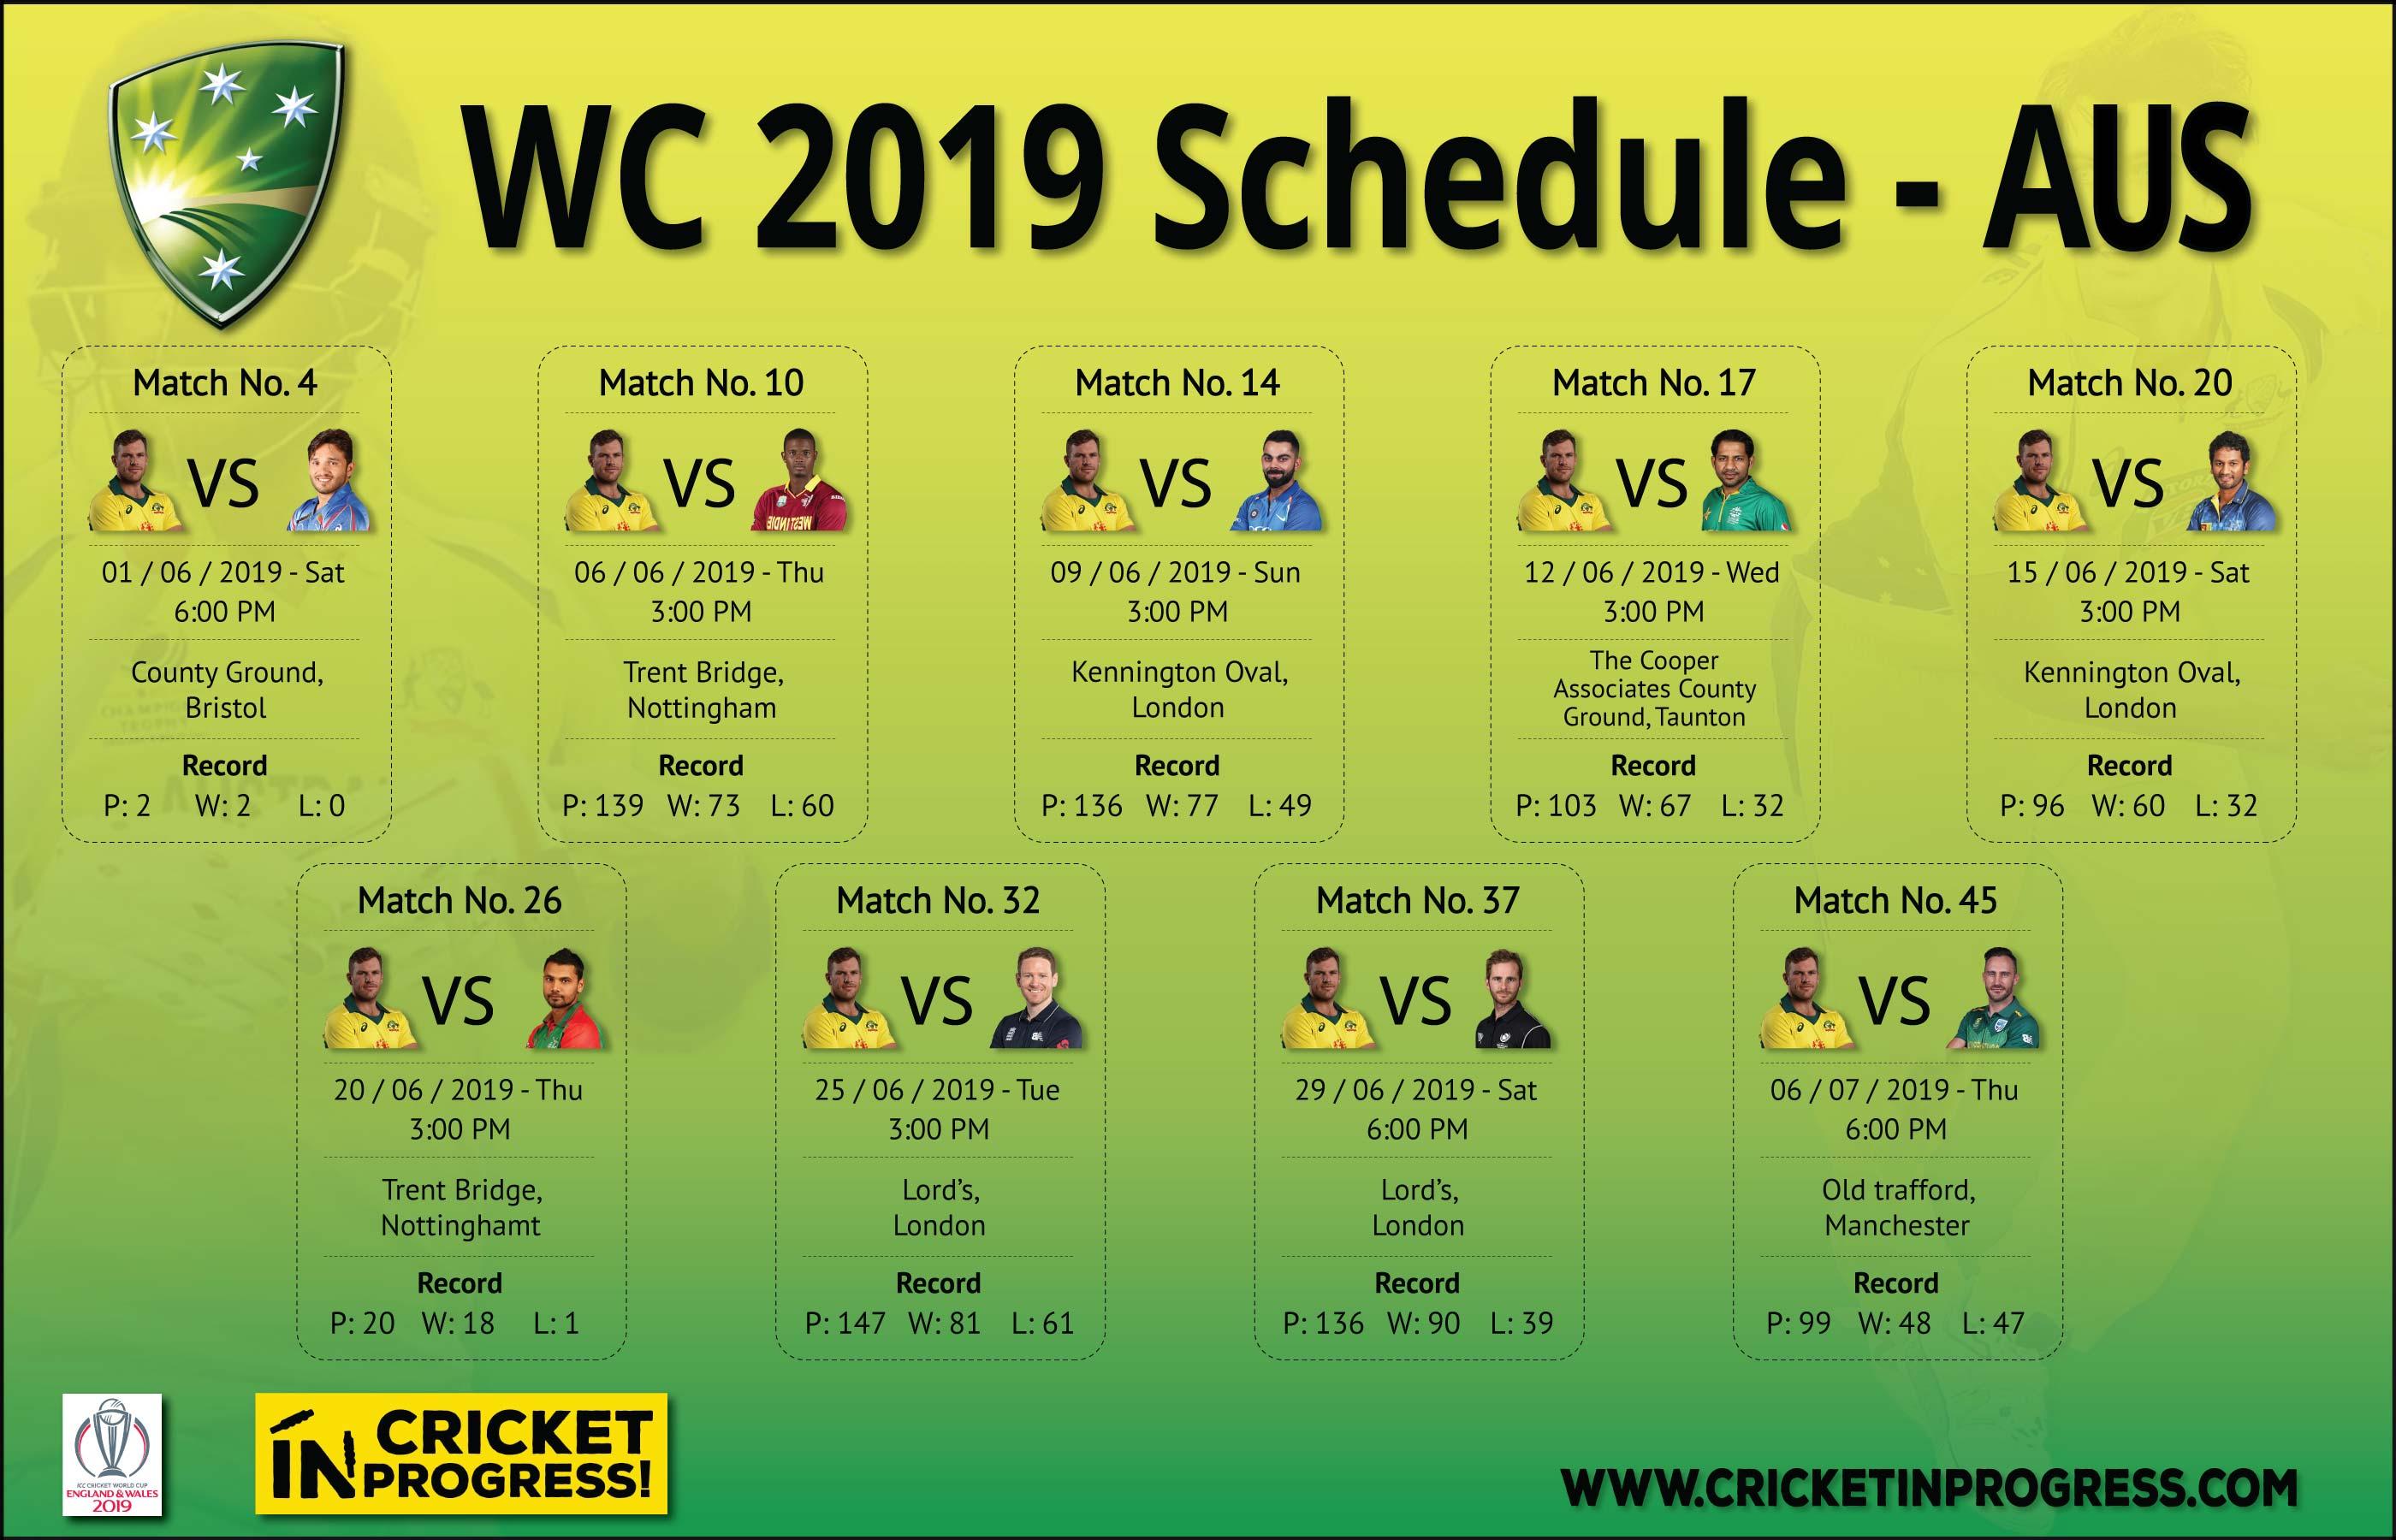 CWC 2019 Australia Schedule